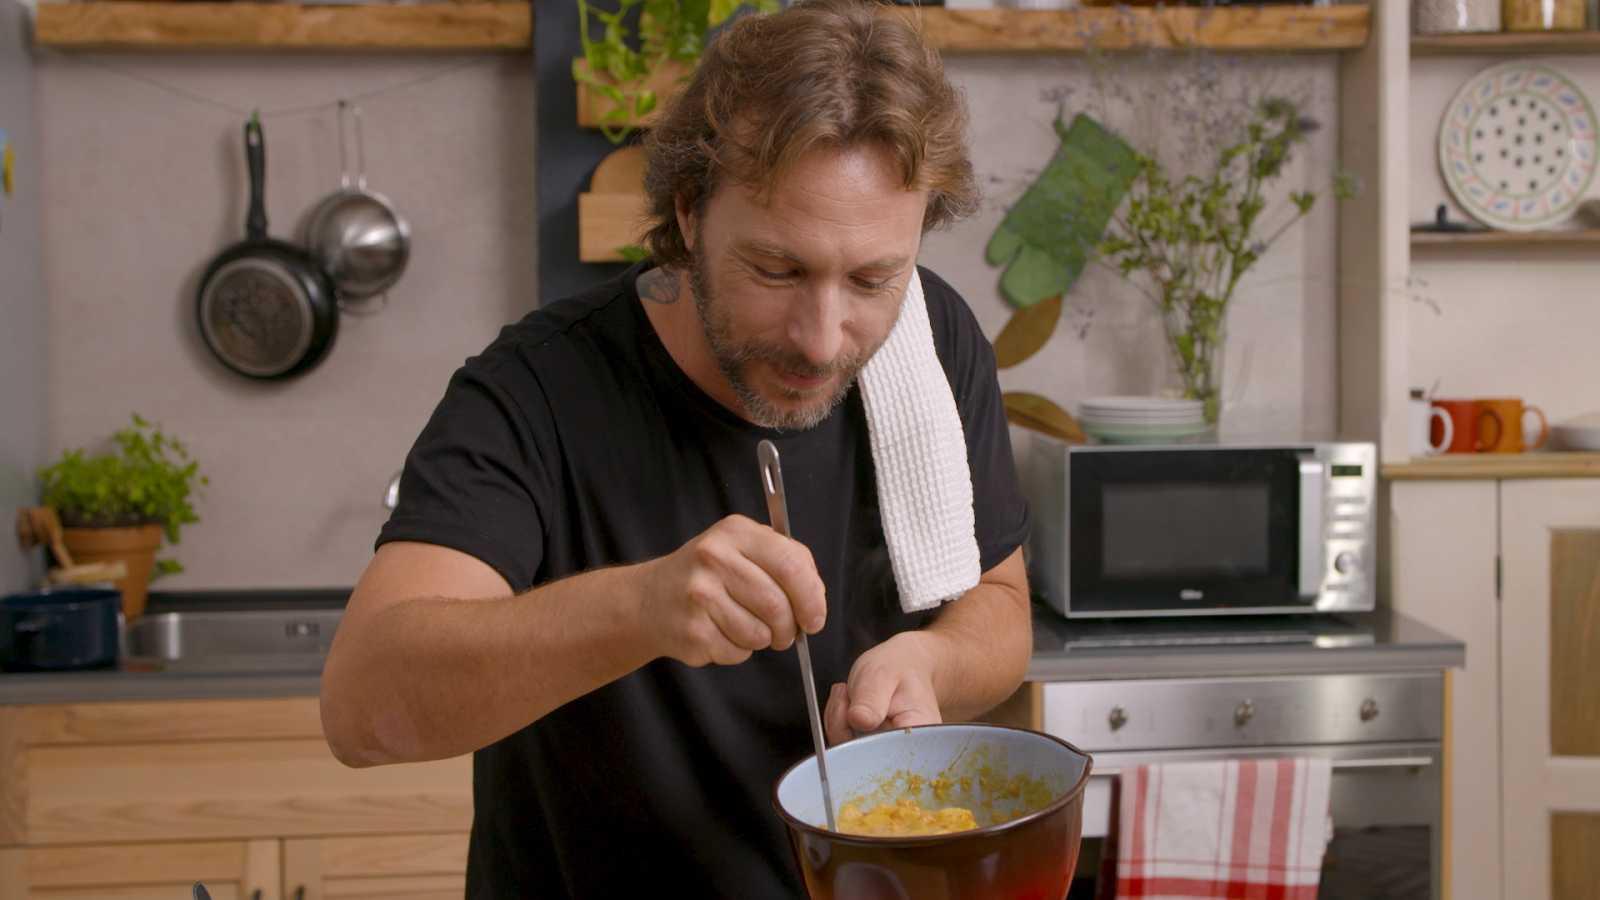 Lentejas Delhi Gipsy Chef